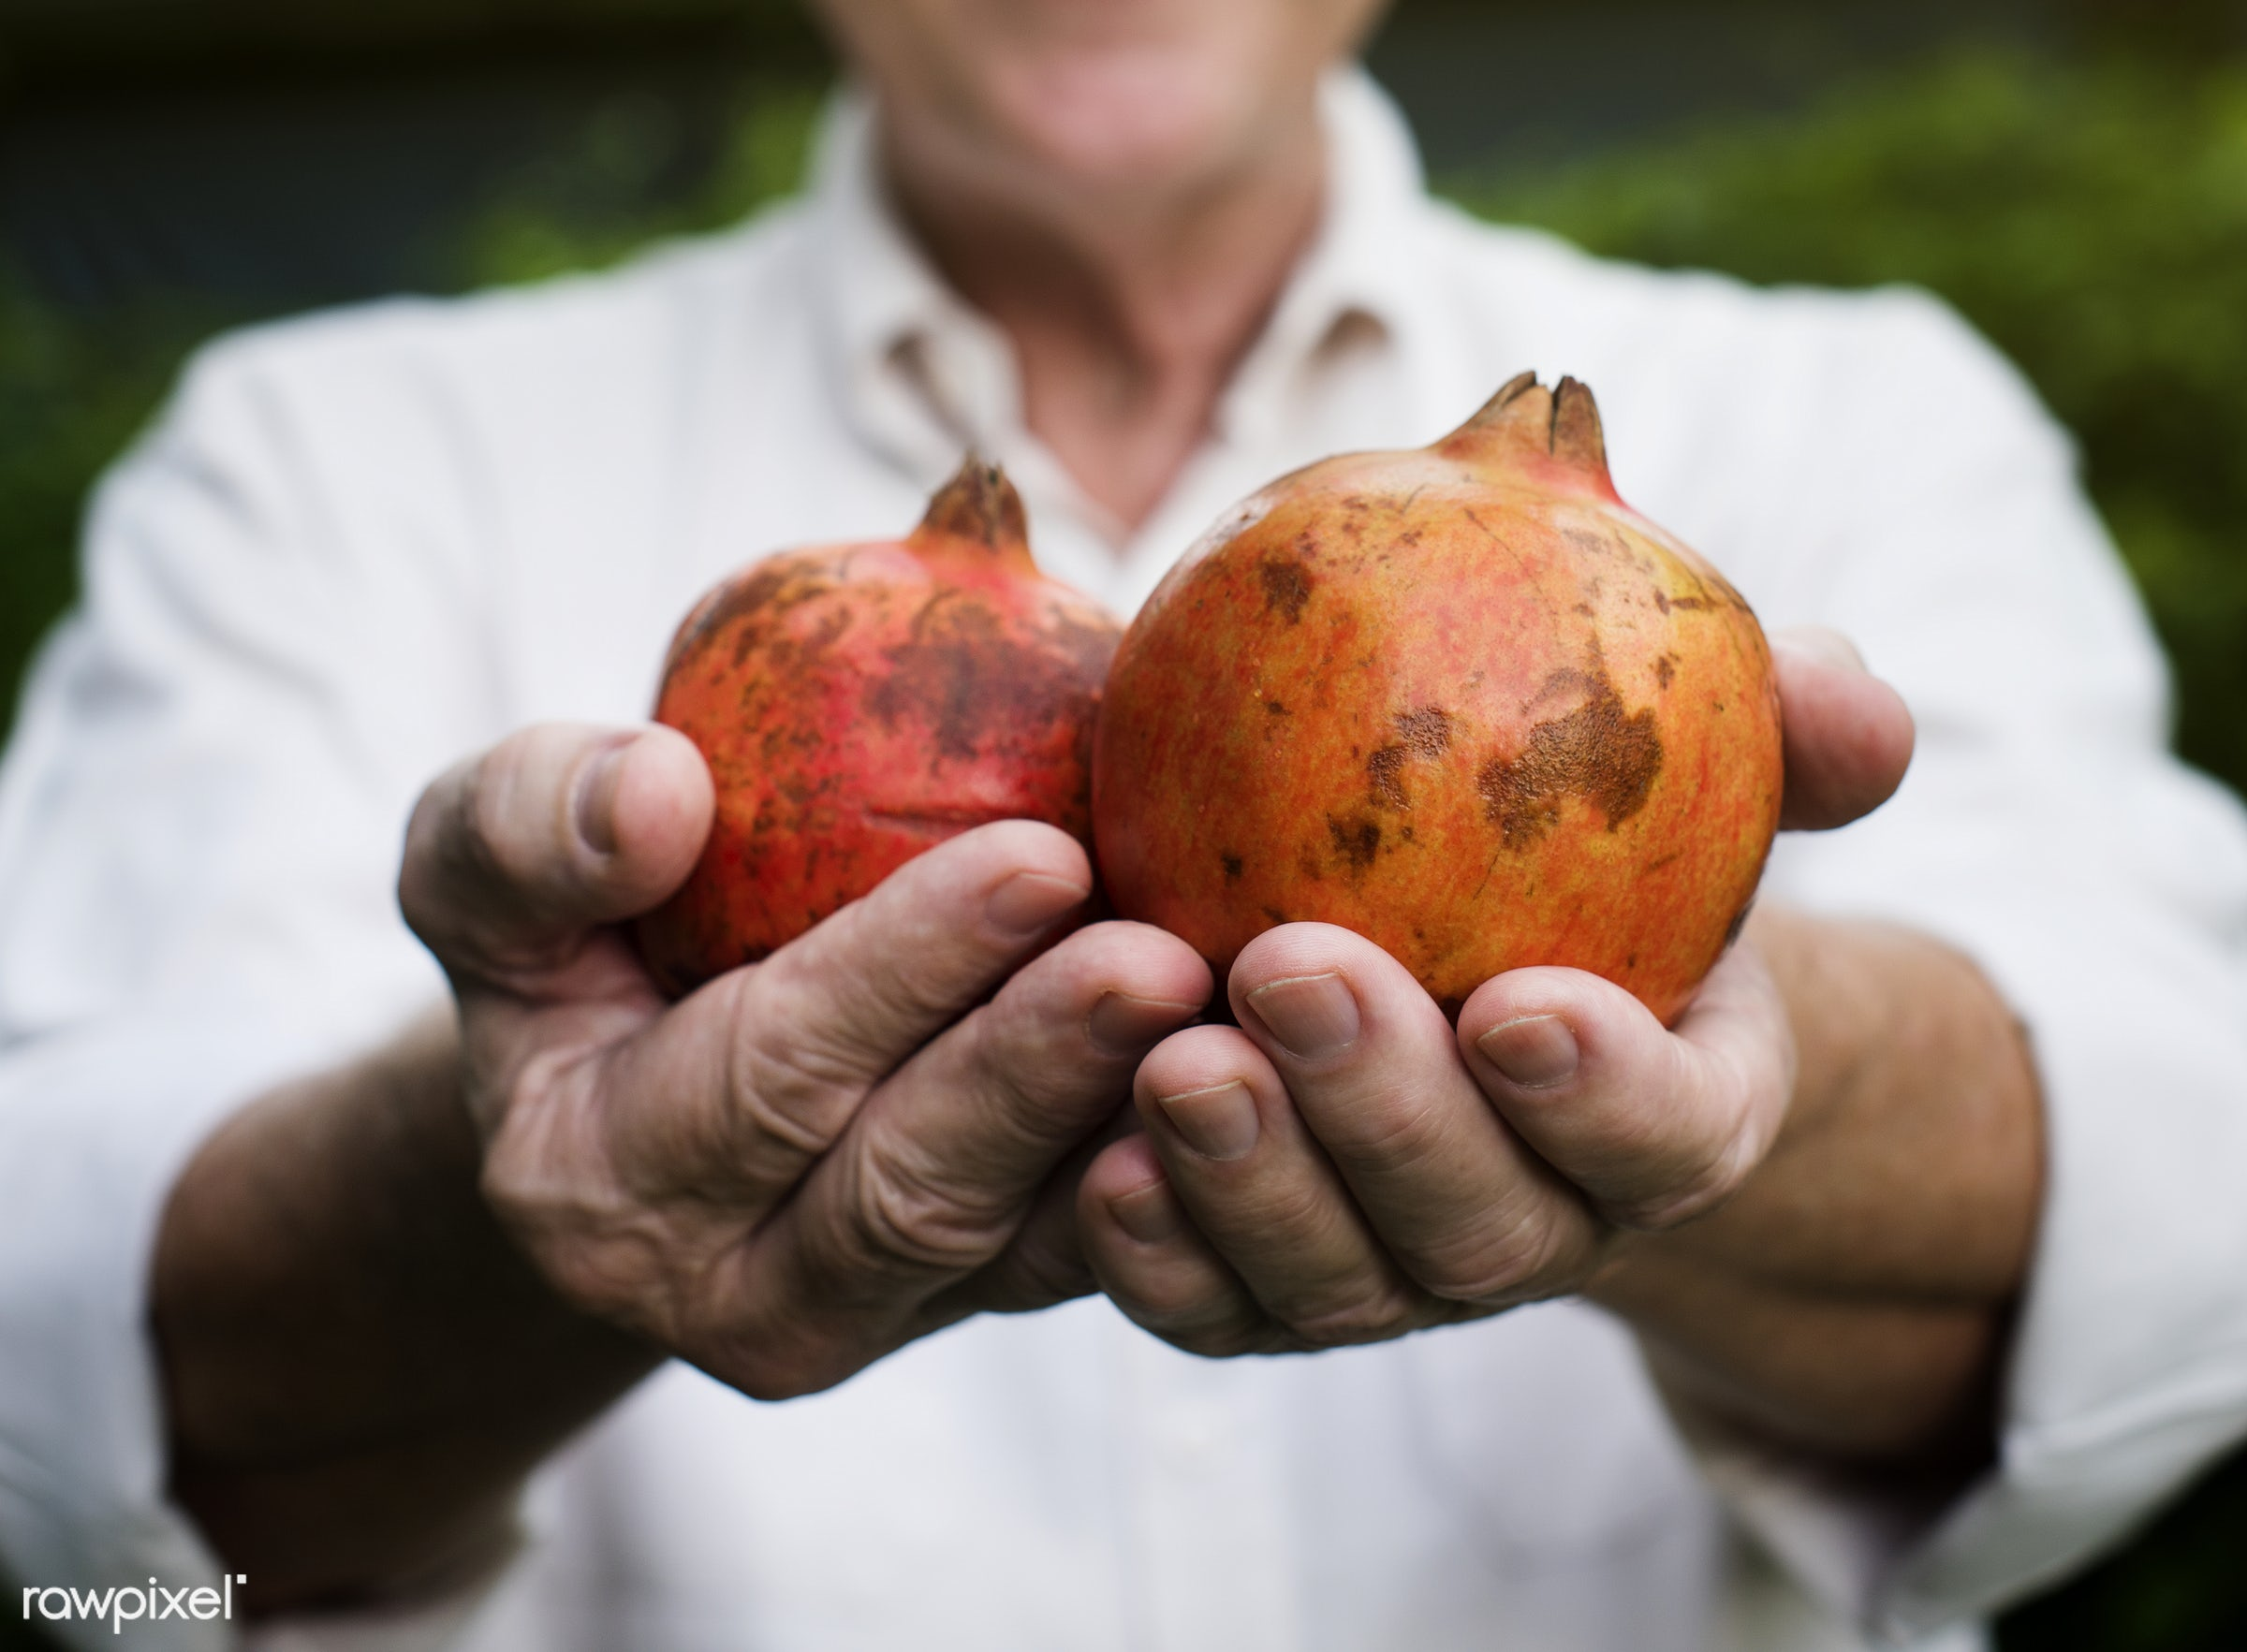 raw, pomegranate, holding, farm, nature, hands, fresh, closeup, fruit, organic, healthy, harvest, produce